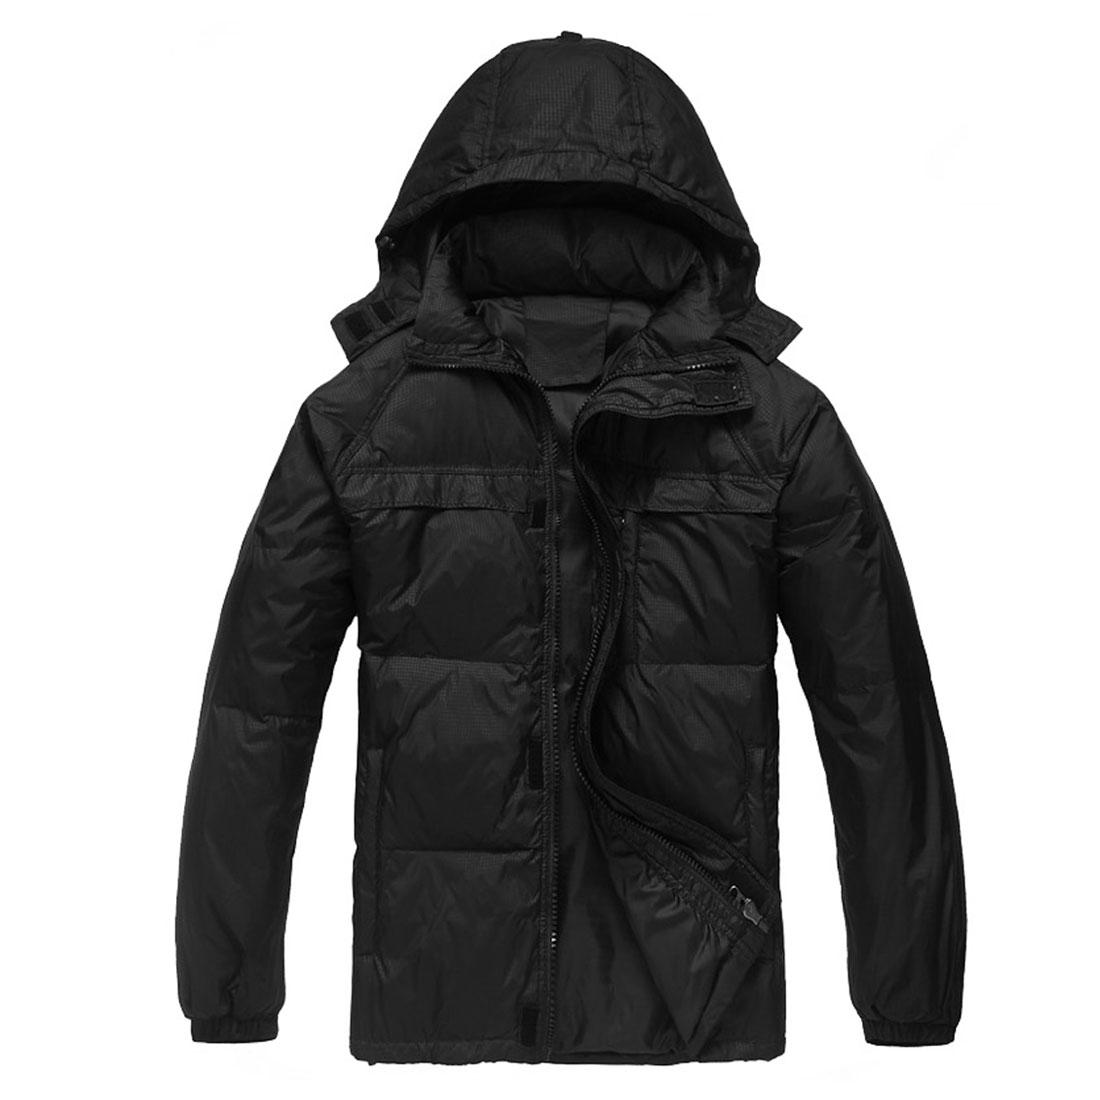 Mens Winter Fashion Zipper Pockets Windproof Black Plaids Coat L